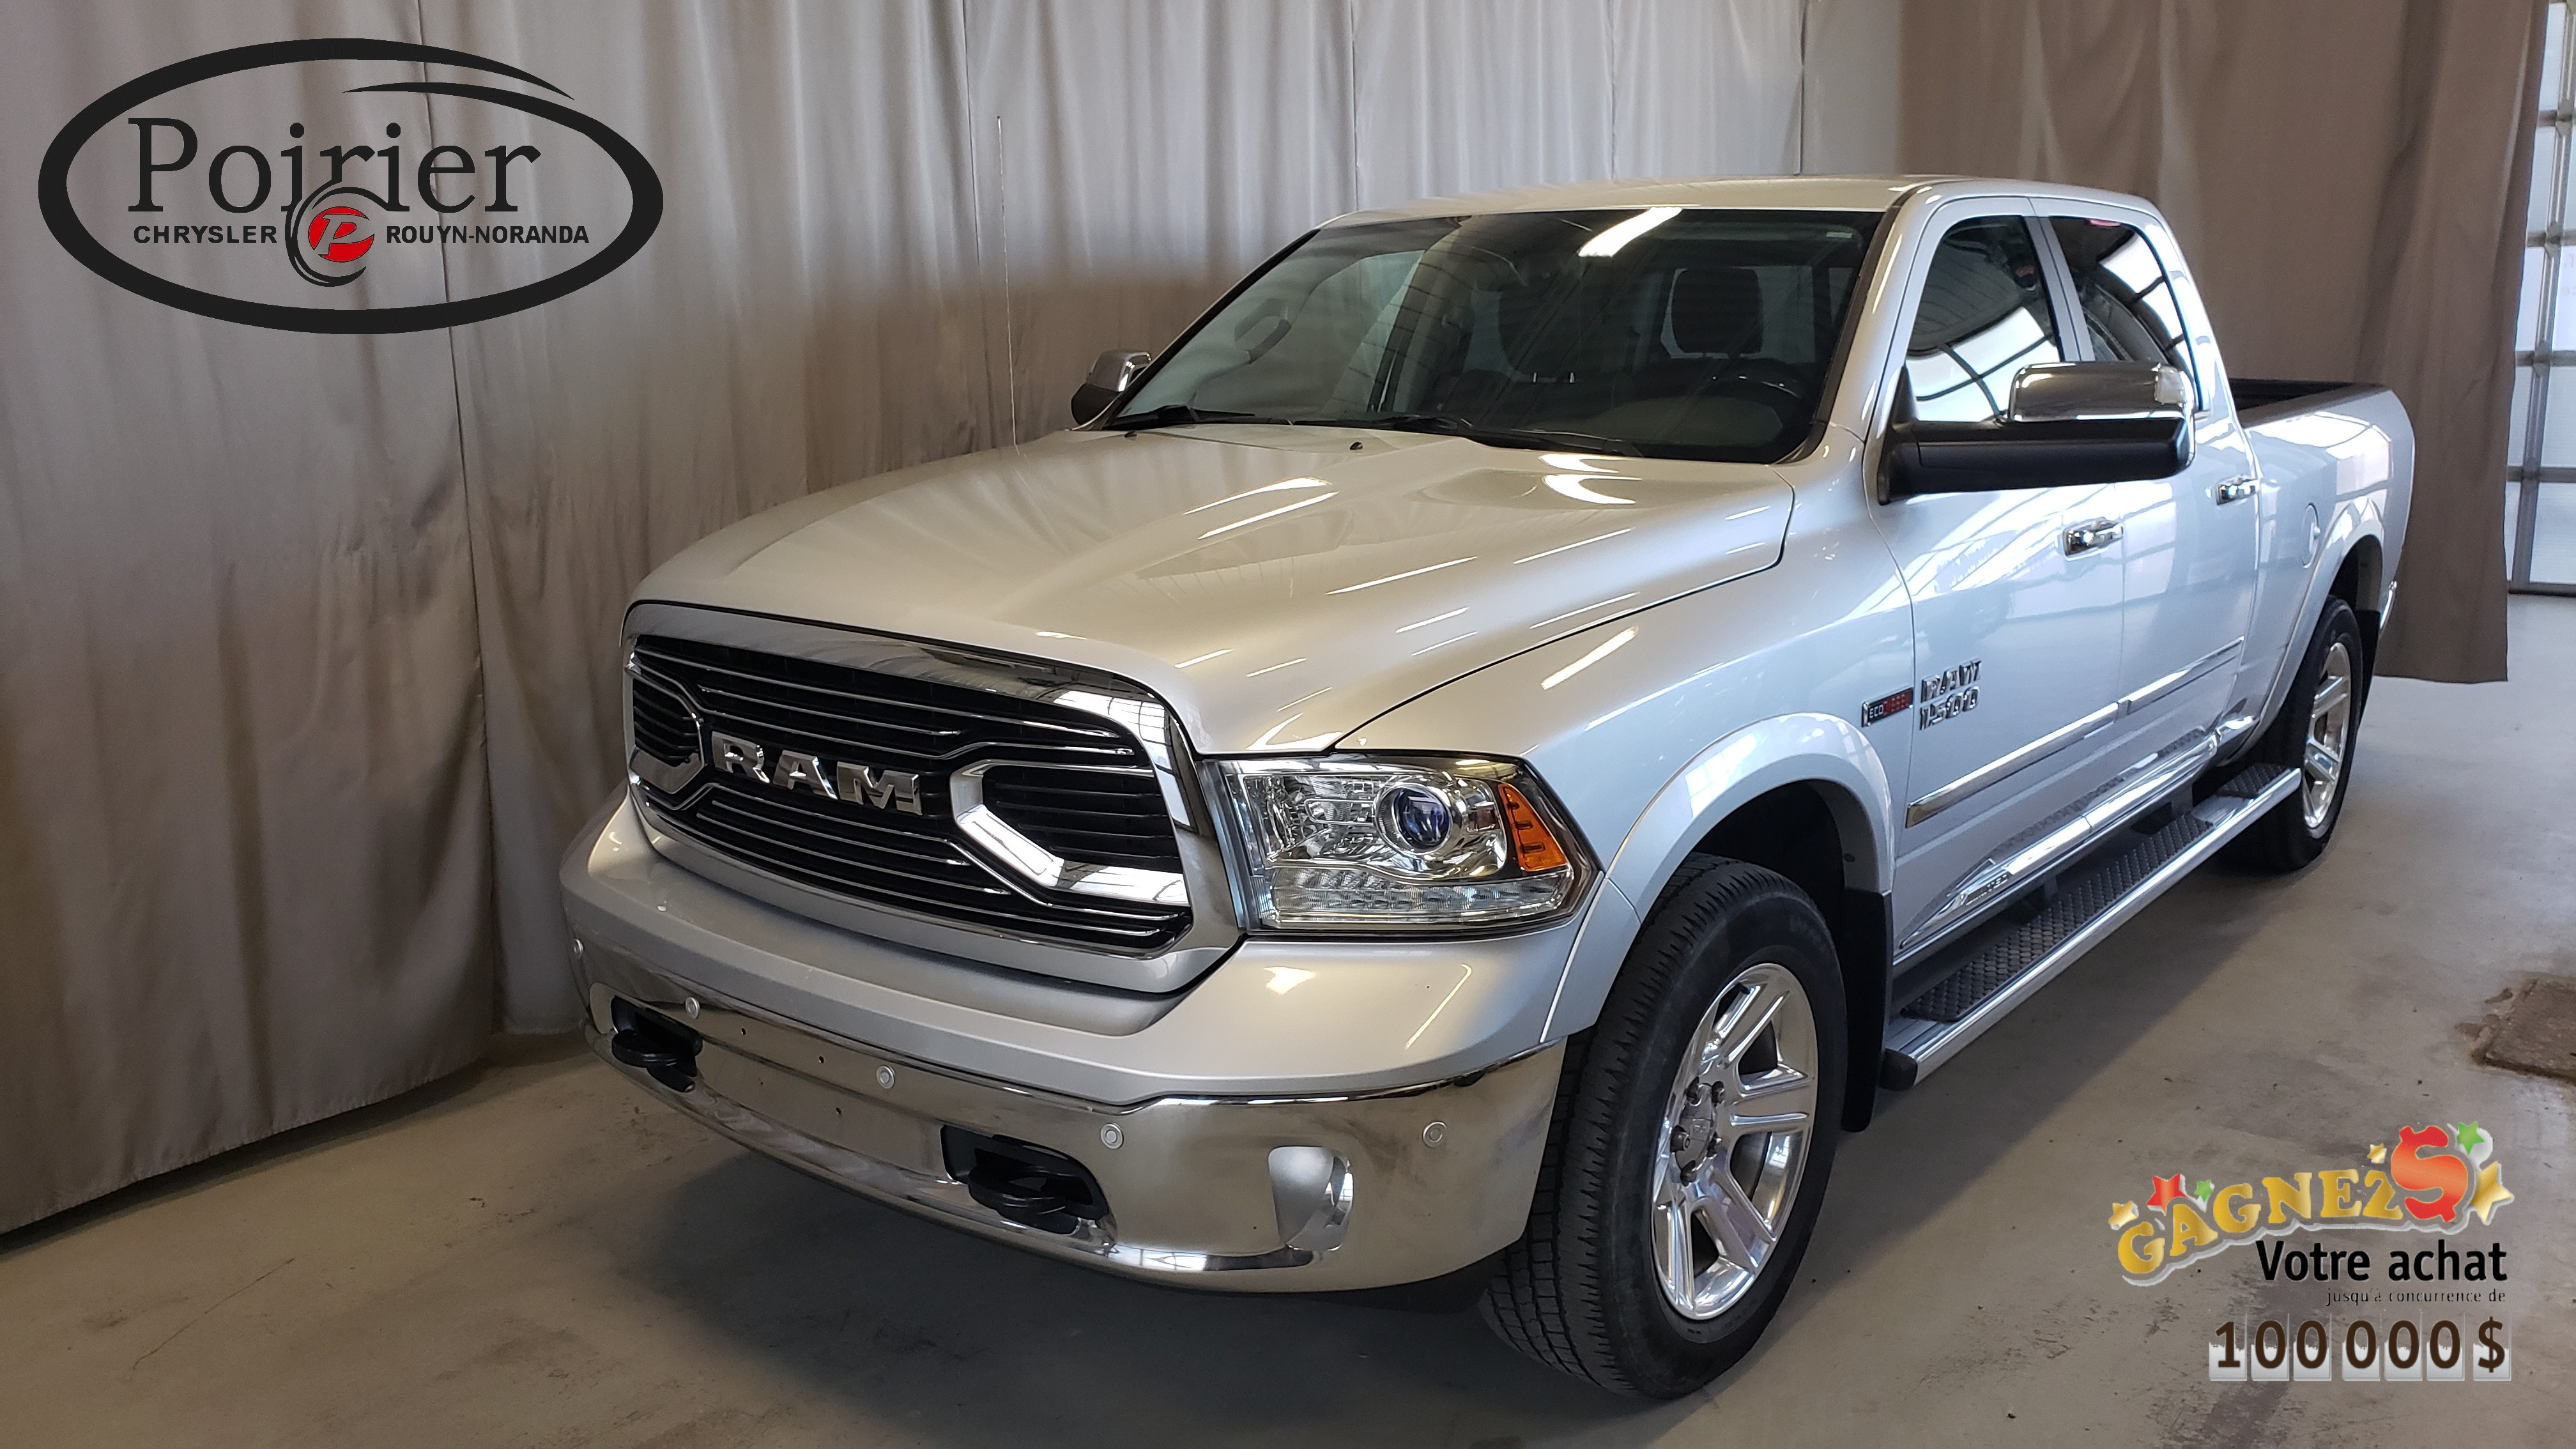 2015 Ram 1500 Laramie Limited luxe et economie Pickup - Crew Cab